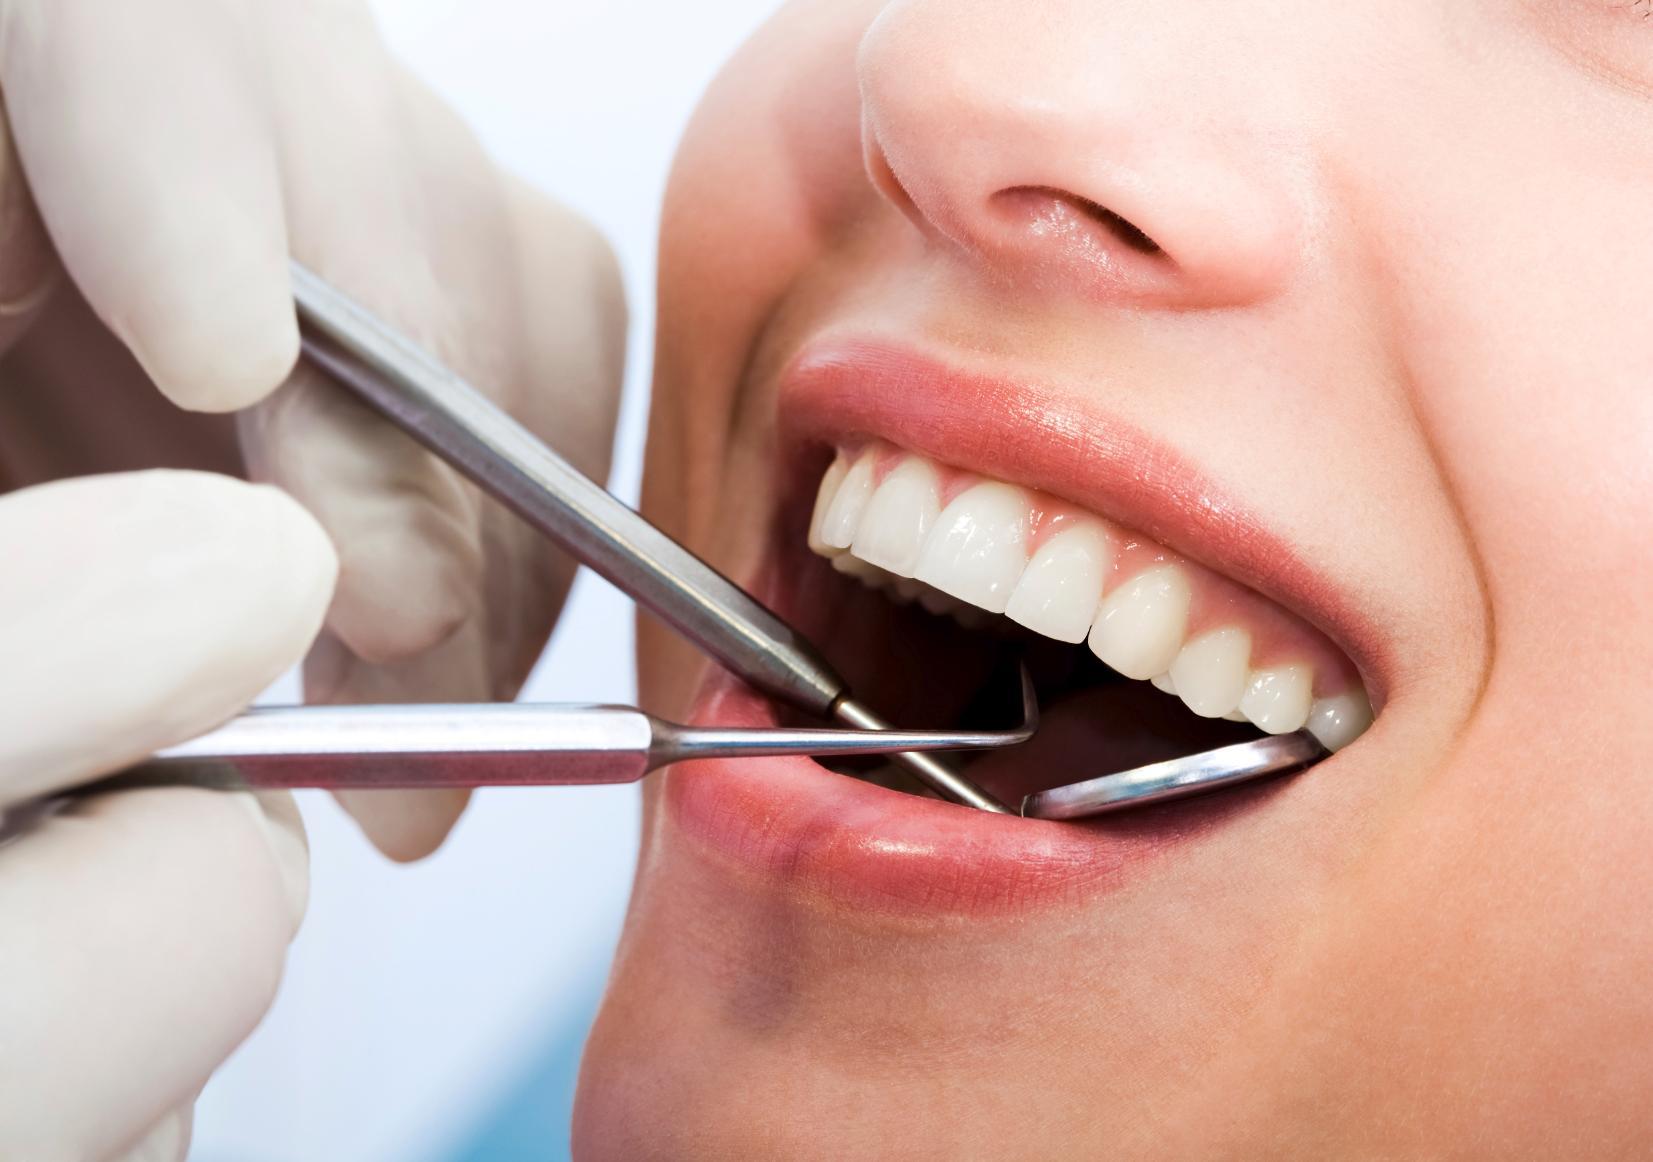 Person having teeth cleaned